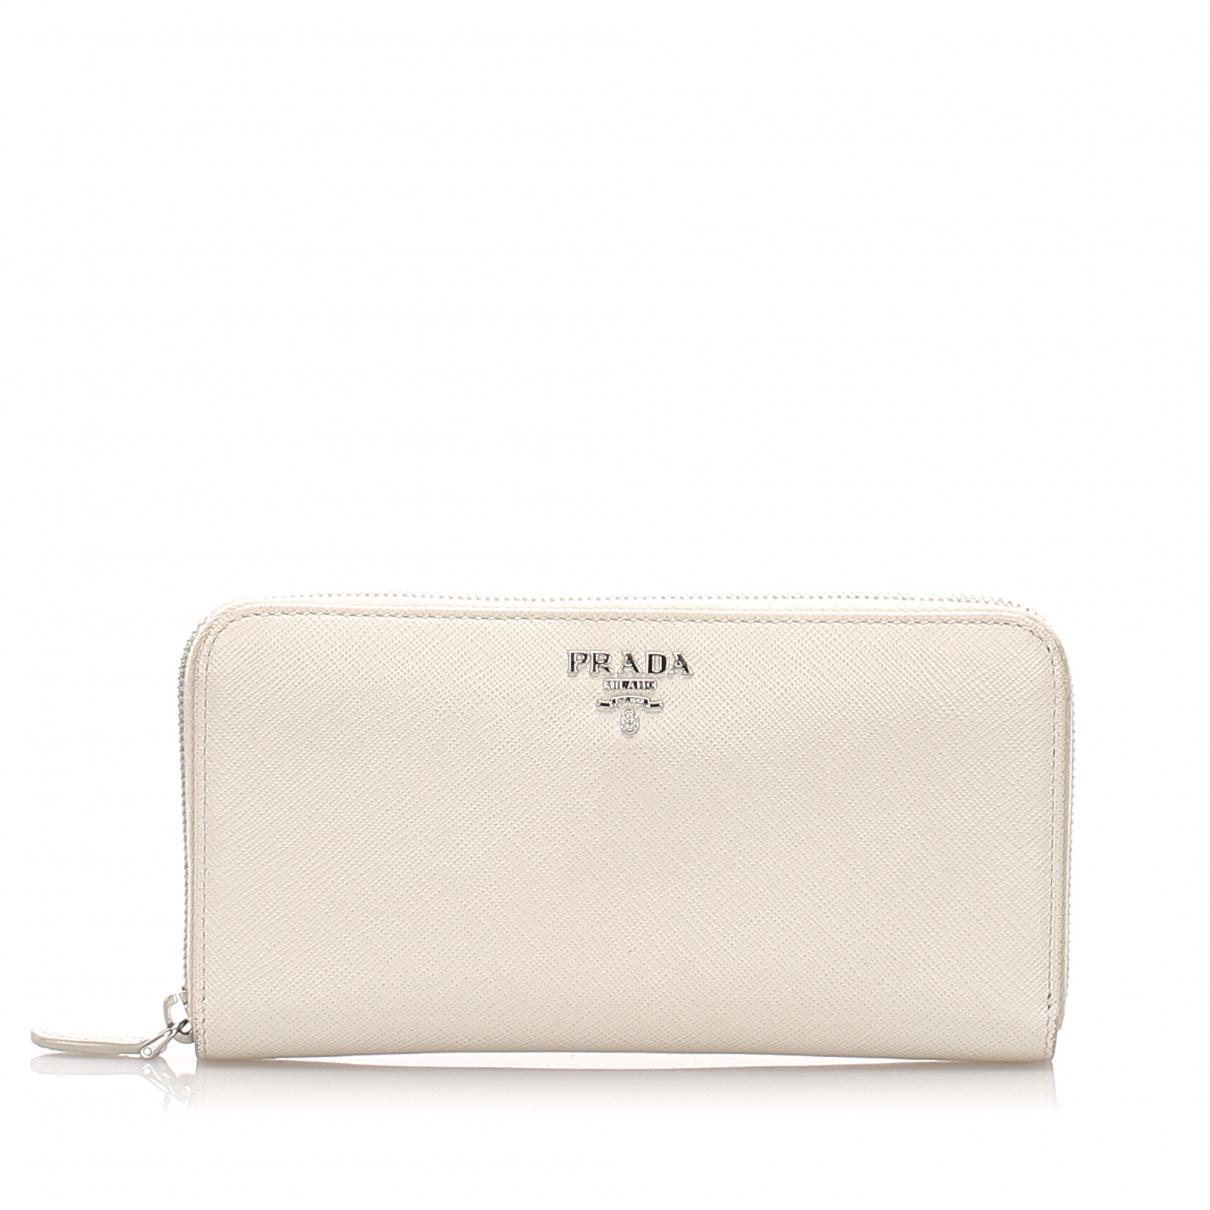 Prada \N White Leather wallet for Women \N